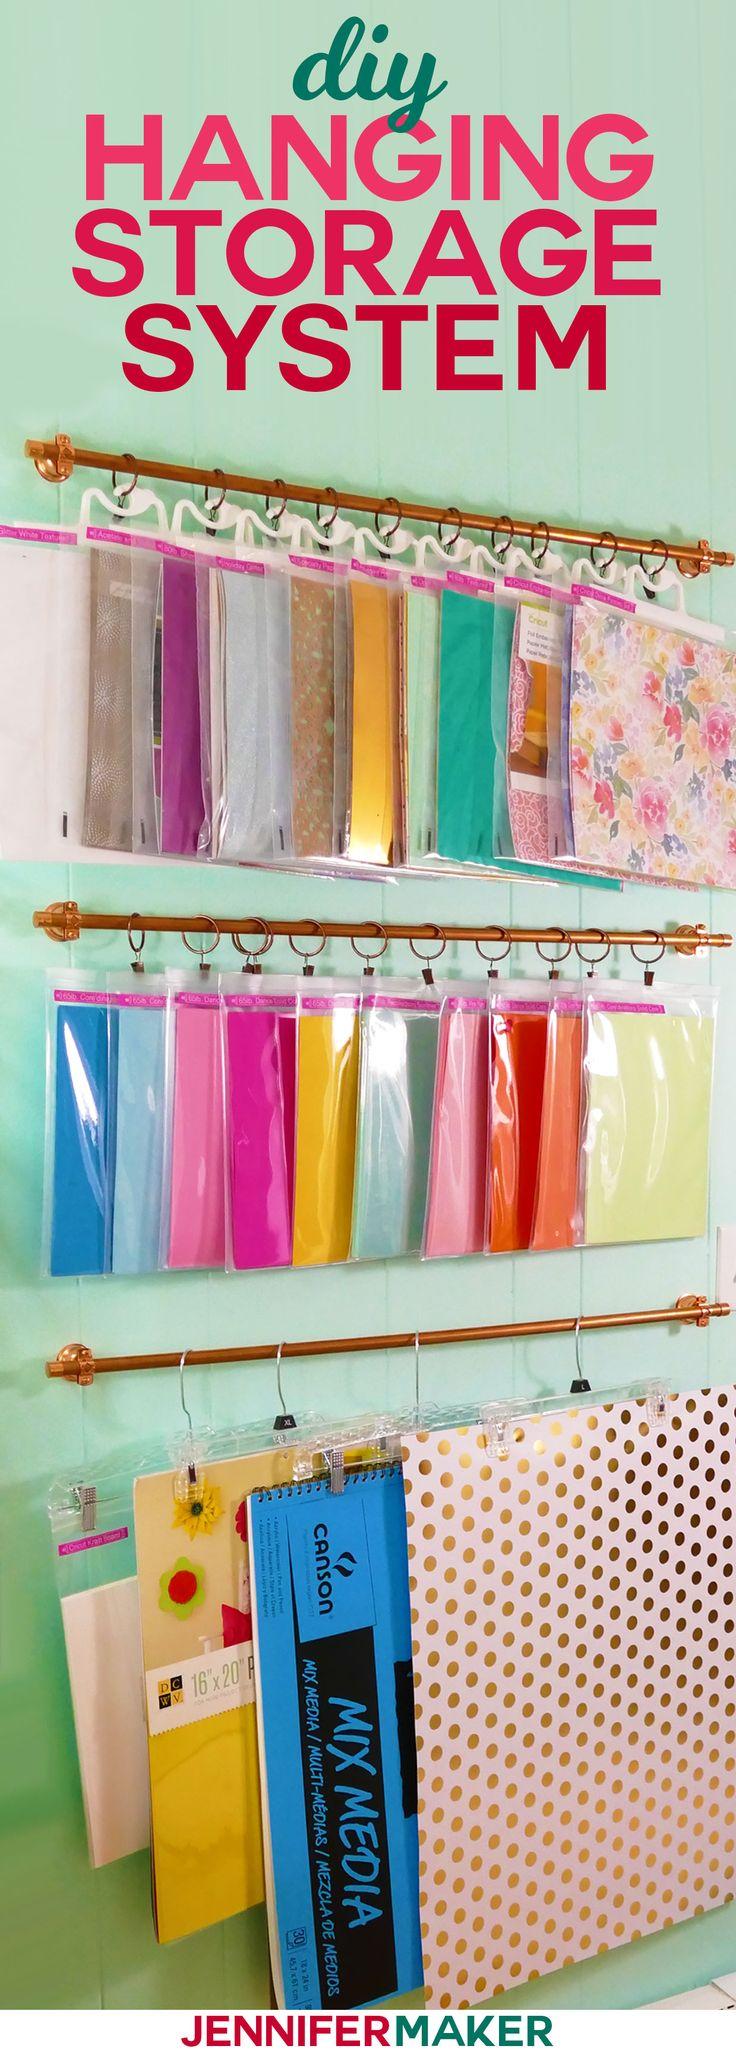 DIY Hanging Storage System for Craft Supplies